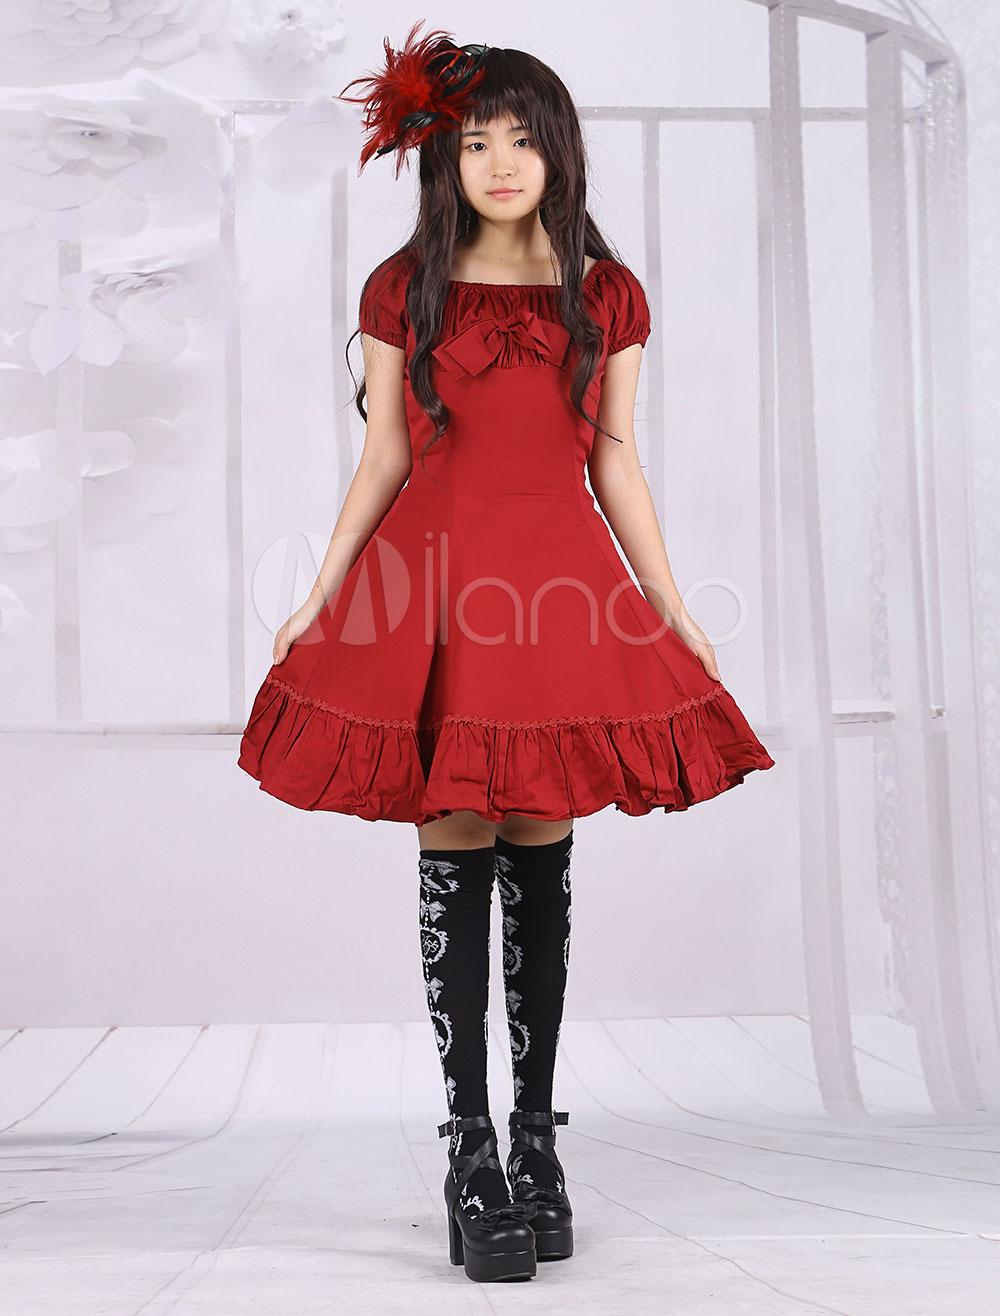 Buy Cotton Fuchsia Red Ruffles Classic Lolita Dress for $82.99 in Milanoo store